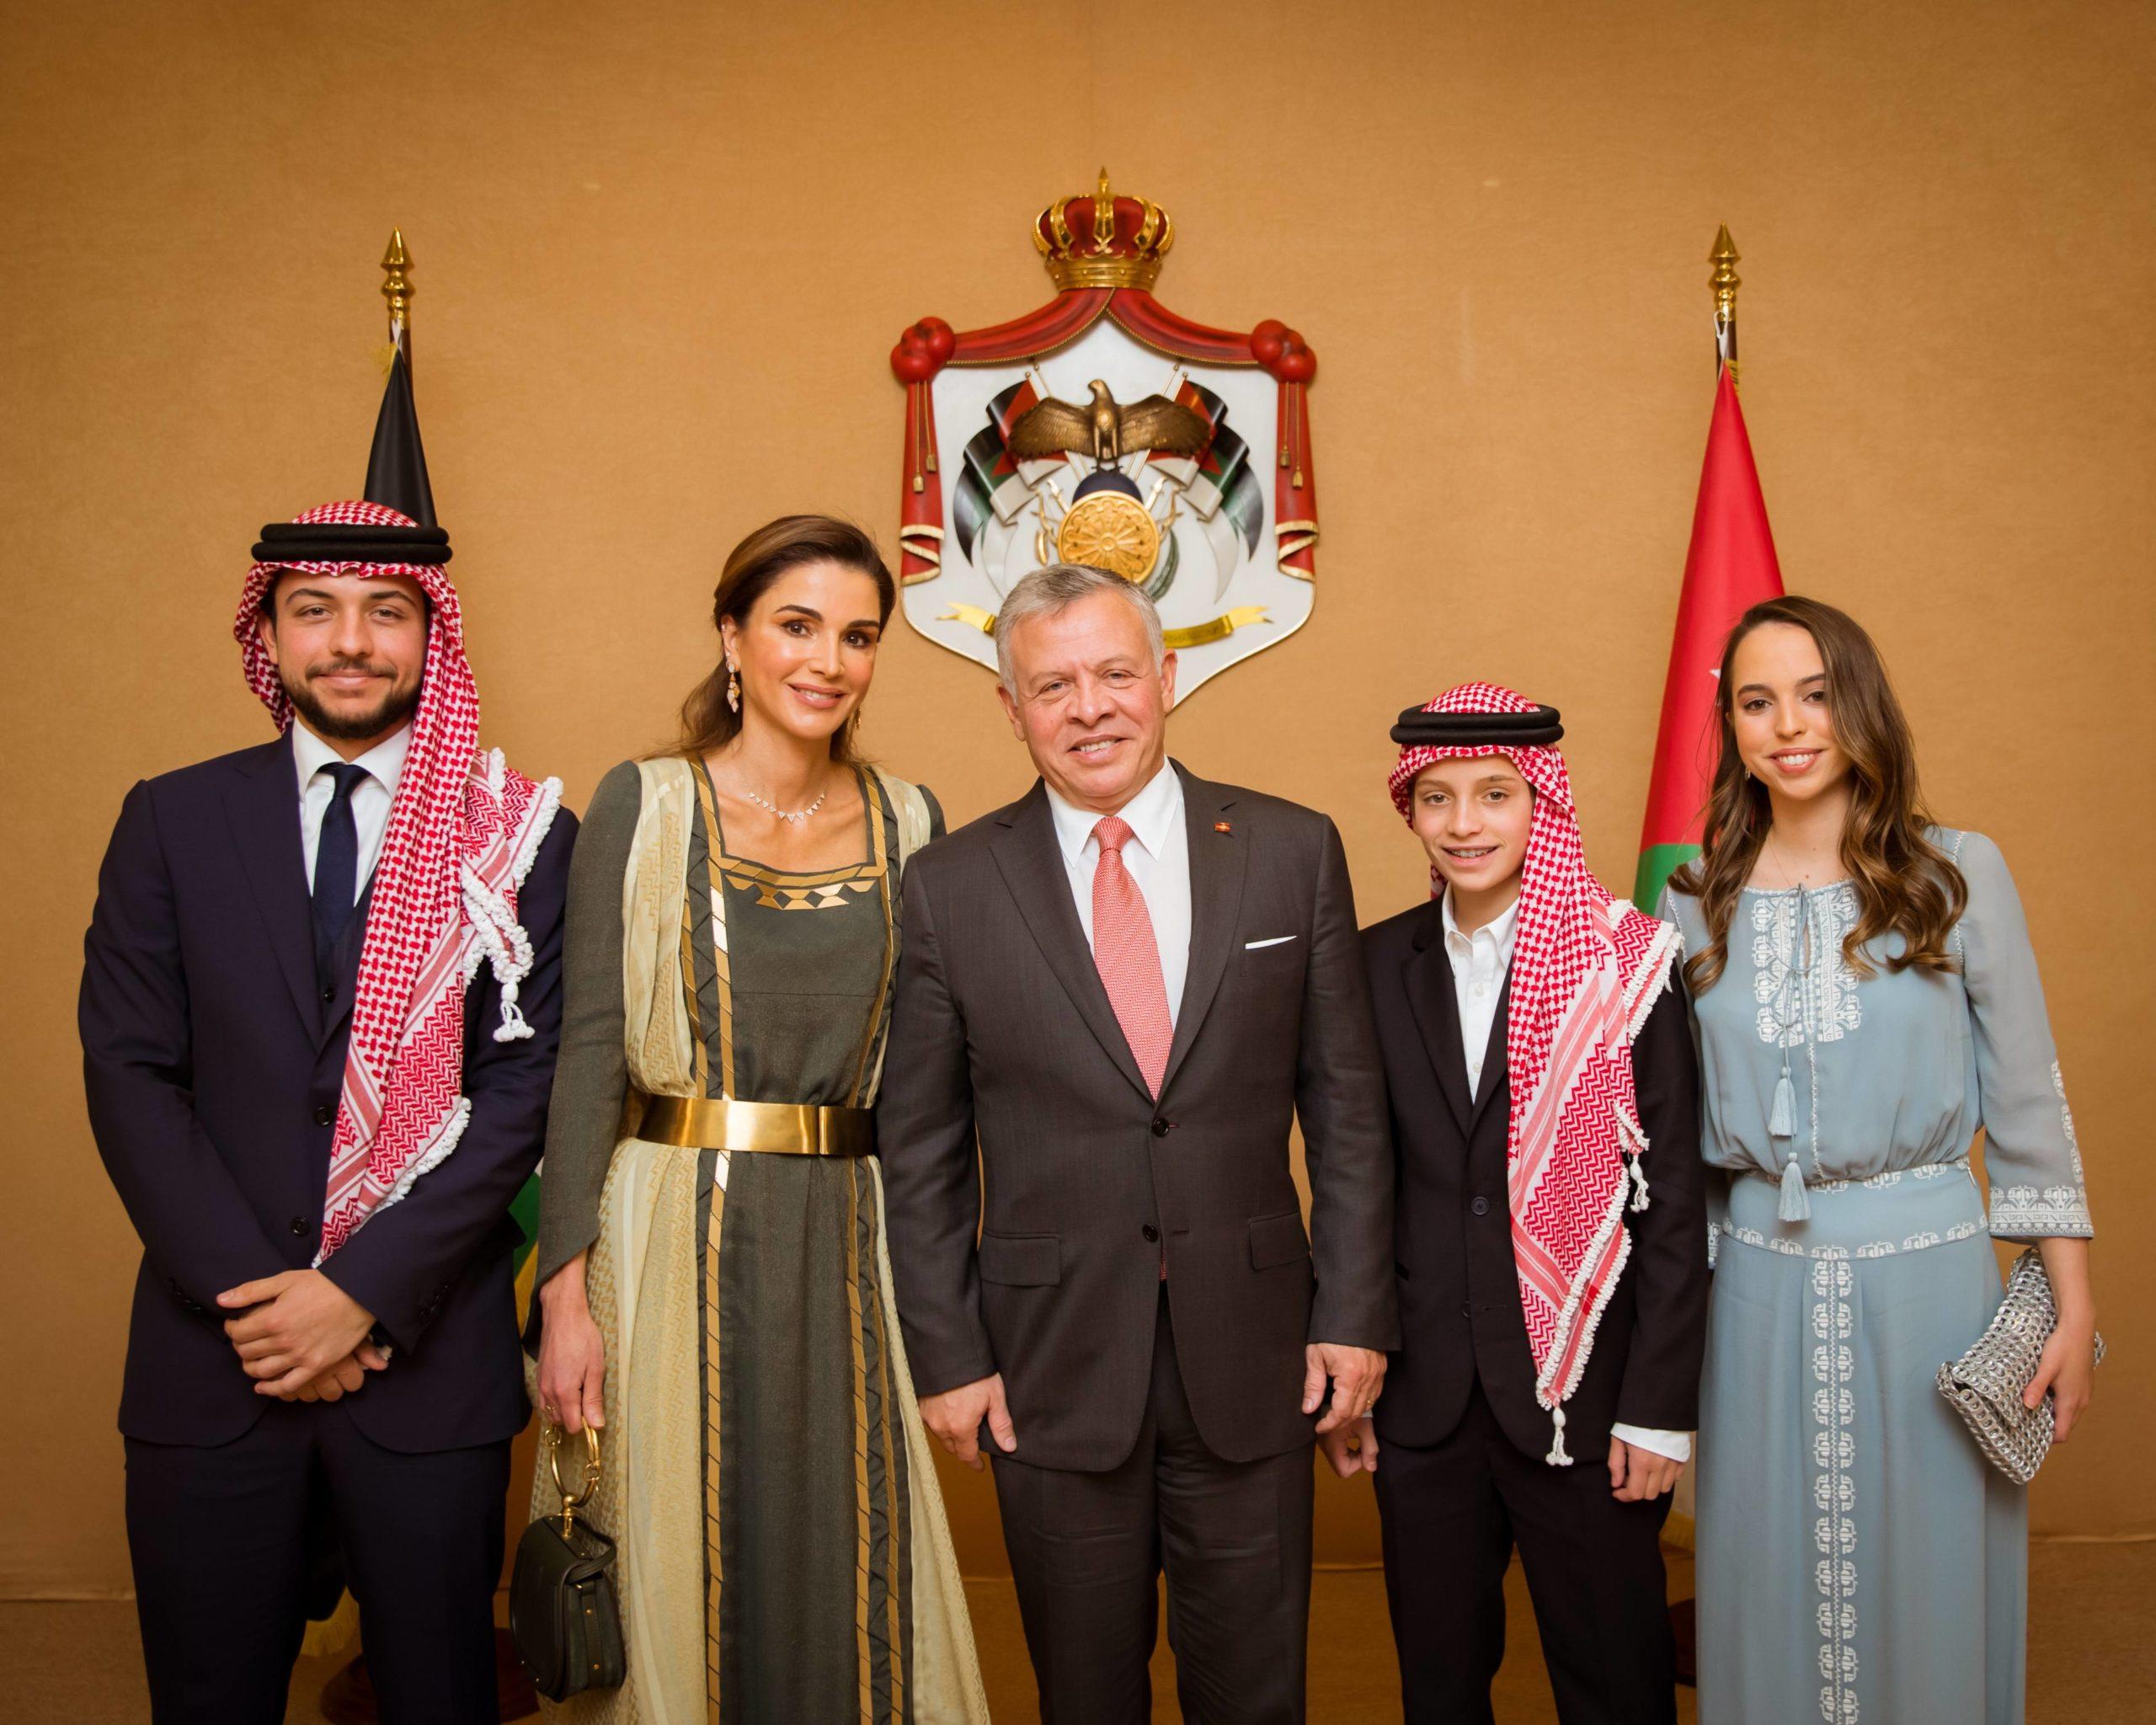 Принц Хуссейн, Королева Рания, Король Абдулла II, принц Хашем и принцесса Сальма. Фото: legion-media.ru